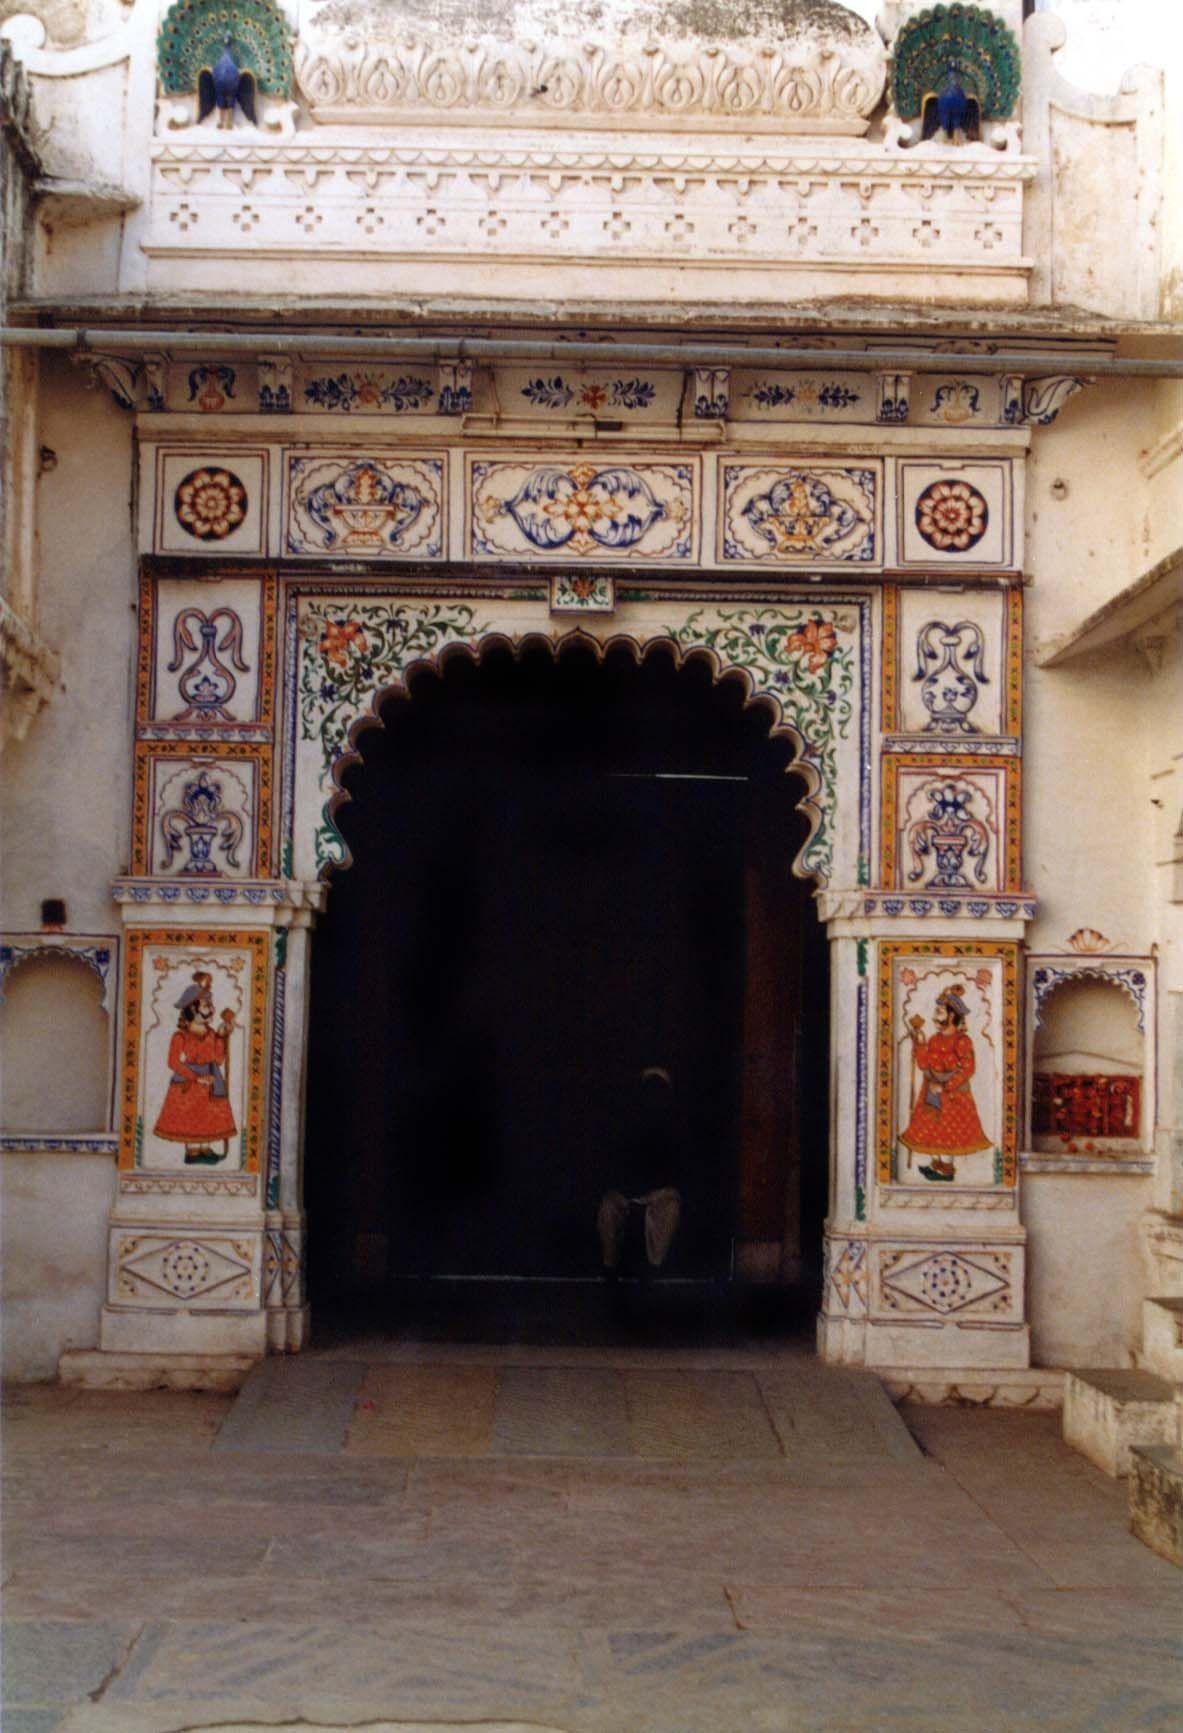 Udaipur doorway, India